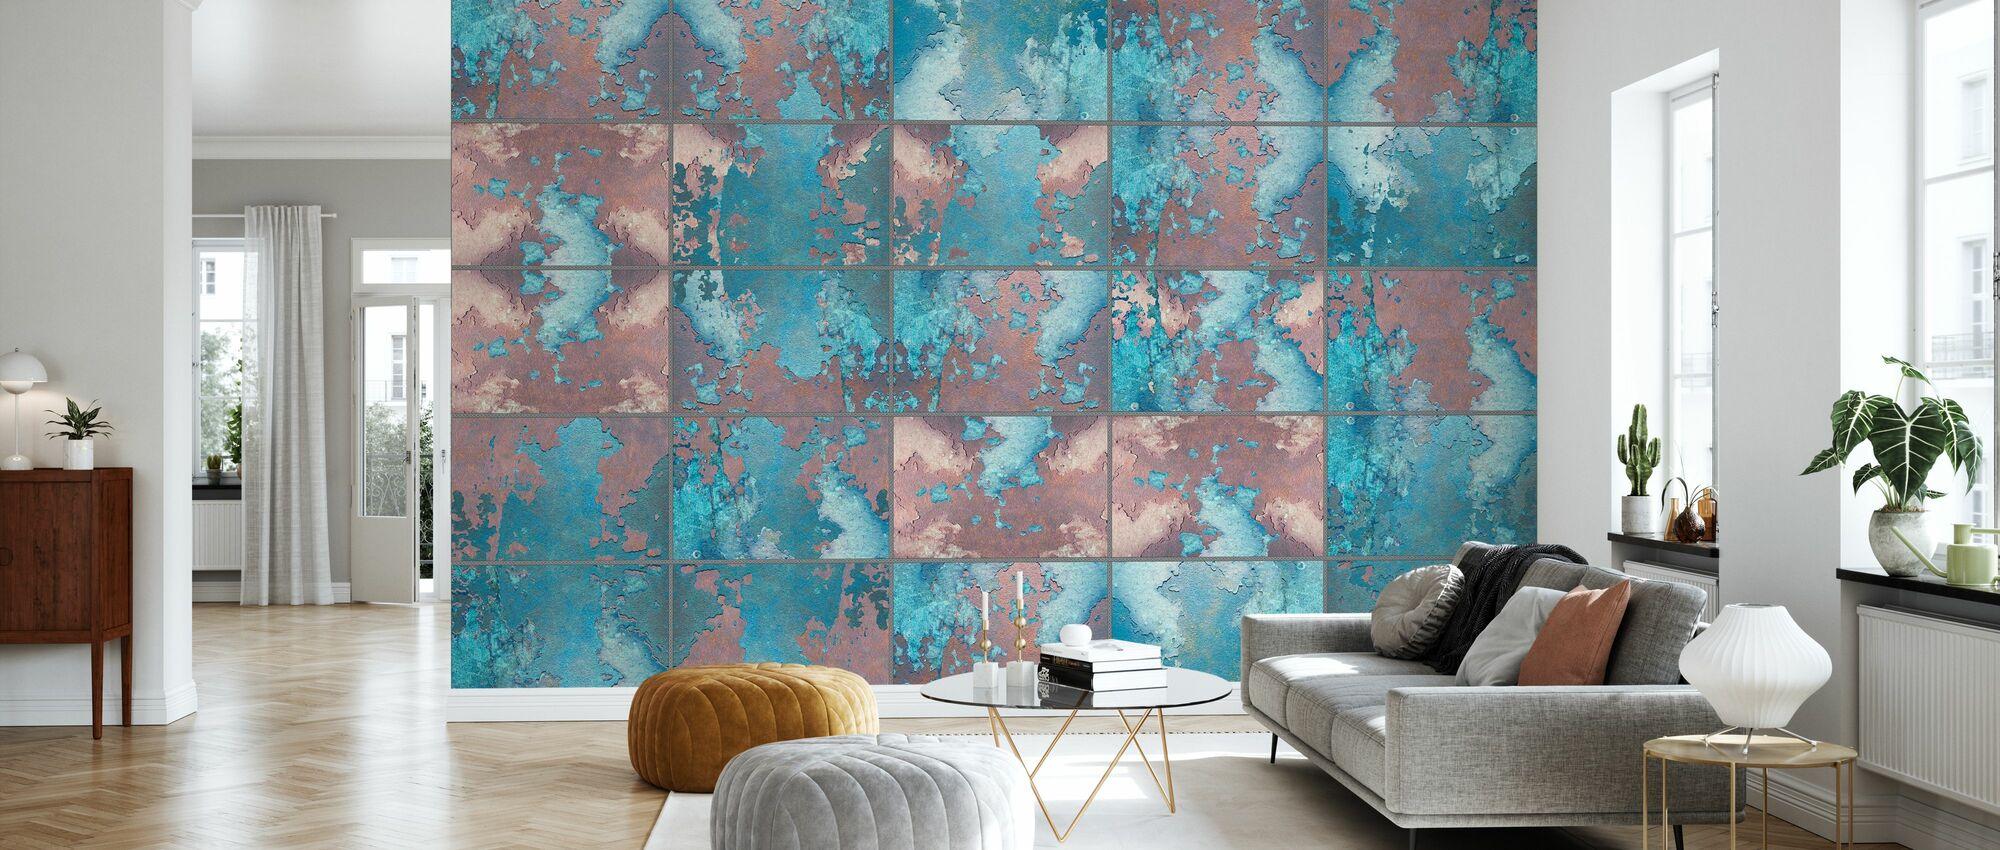 Rustic Metal Wall Panels - Wallpaper - Living Room